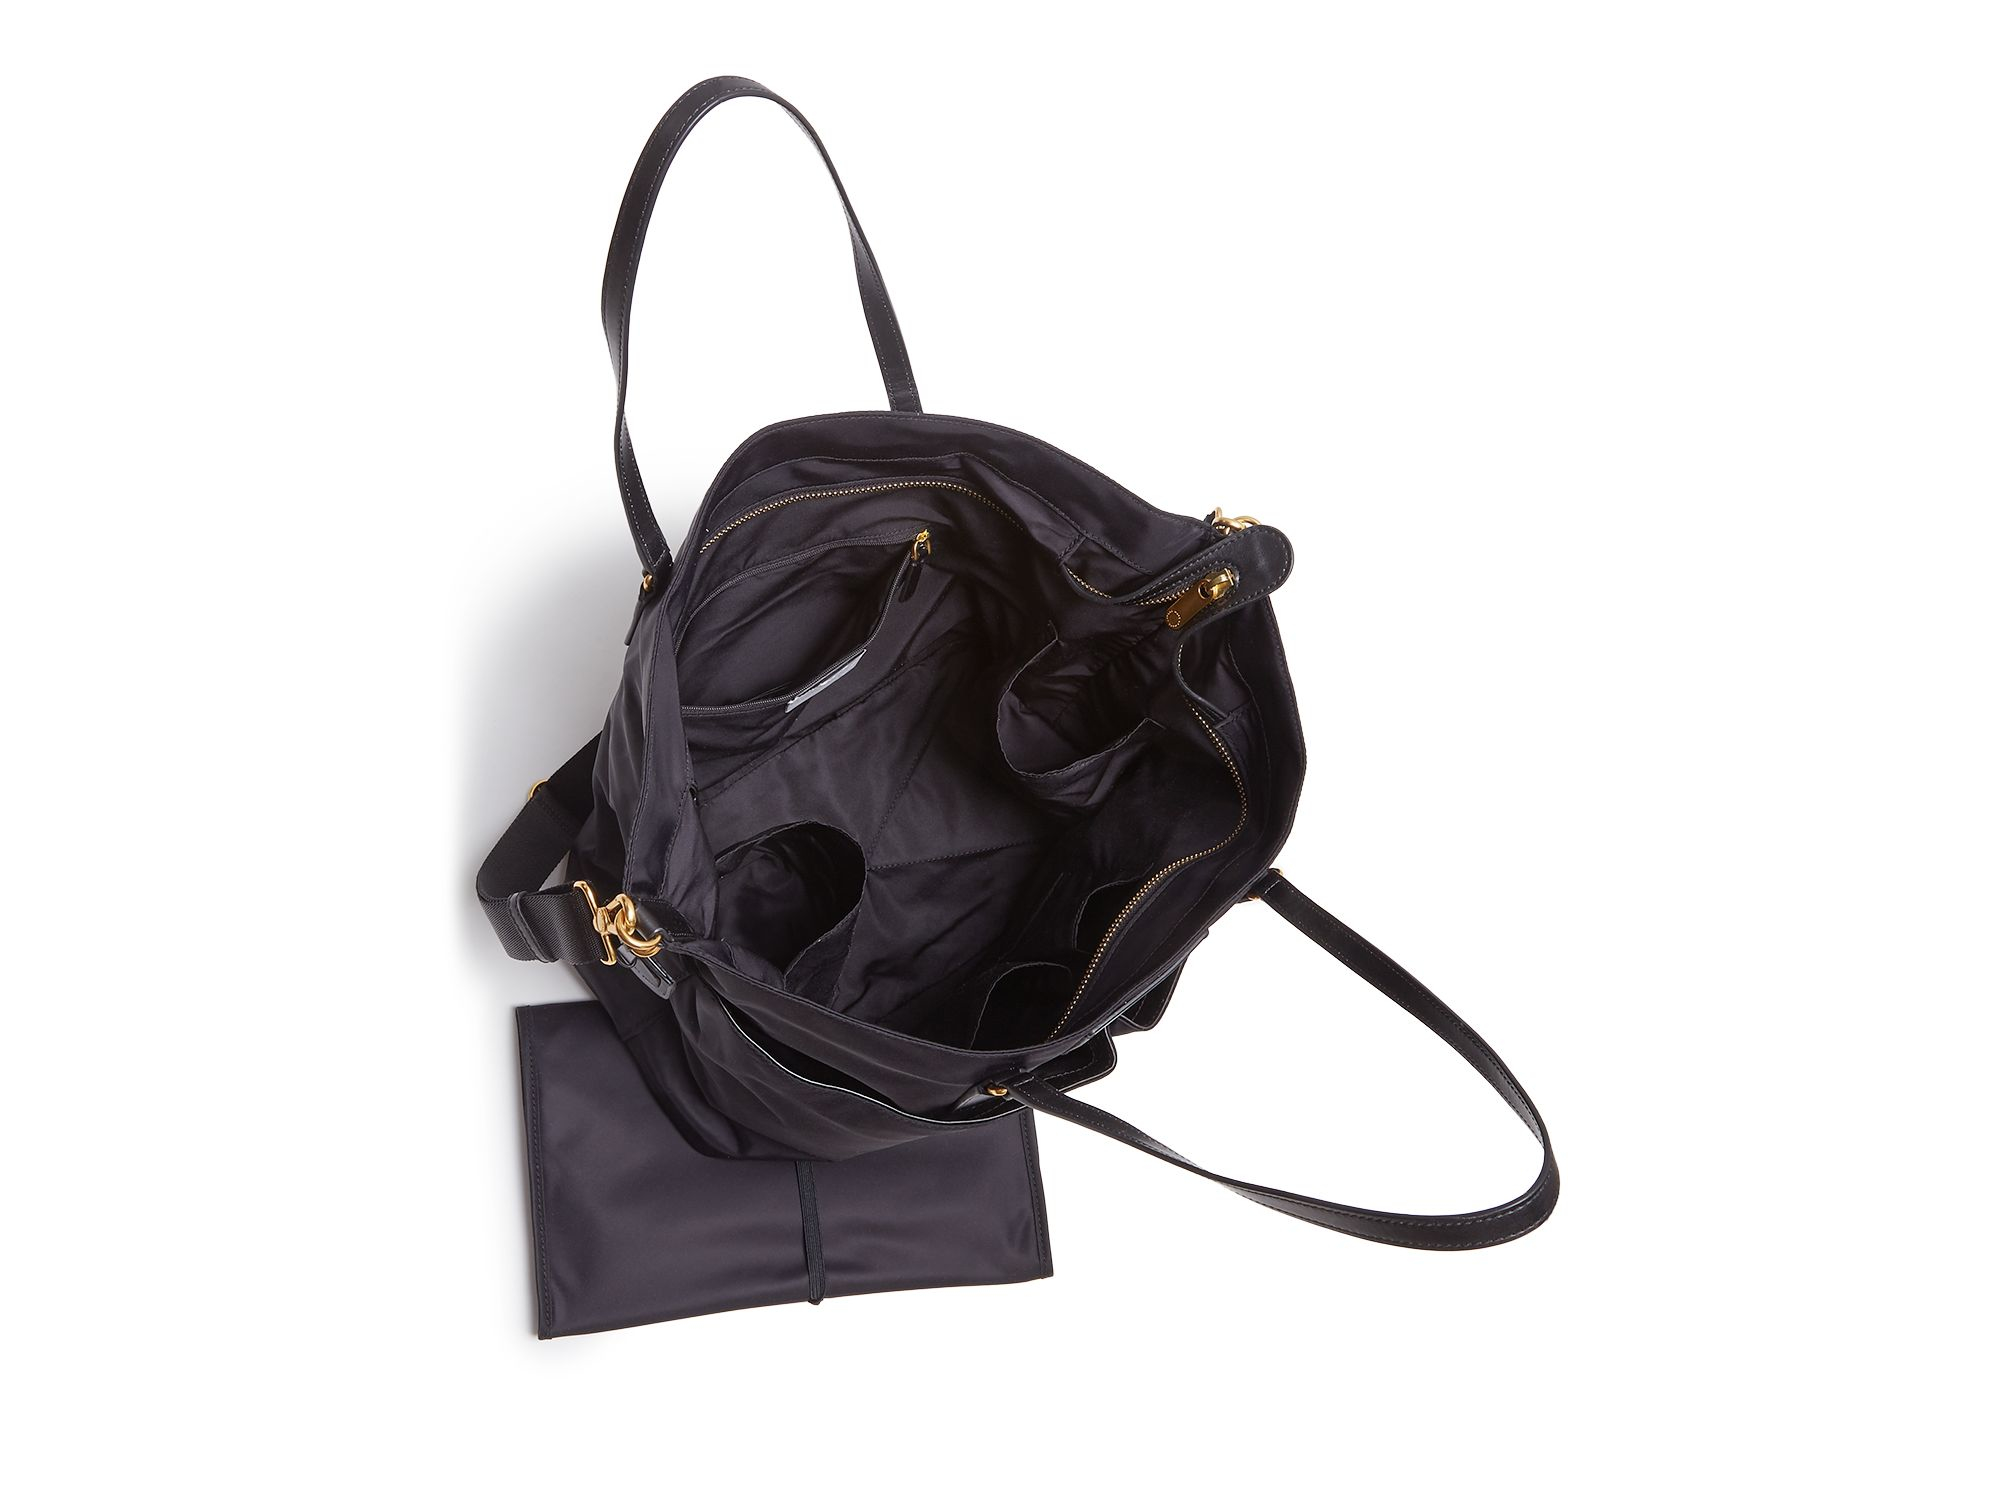 bd508a96929f Lyst - Marc Jacobs Preppy Legend Elizababy Diaper Bag in Black